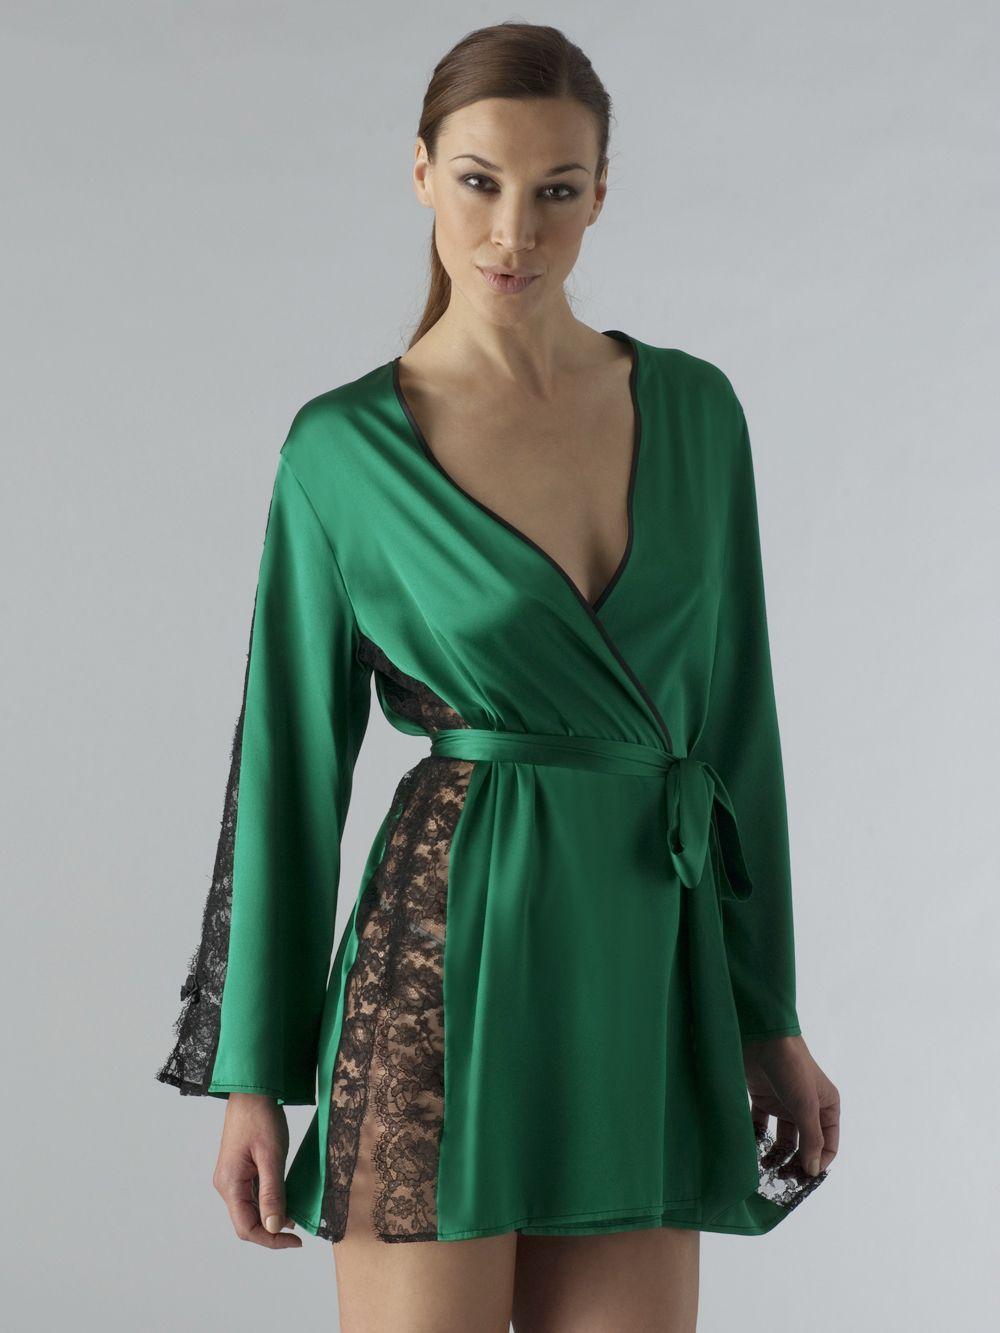 da883411813c Luxurious silk robe. Every woman needs one